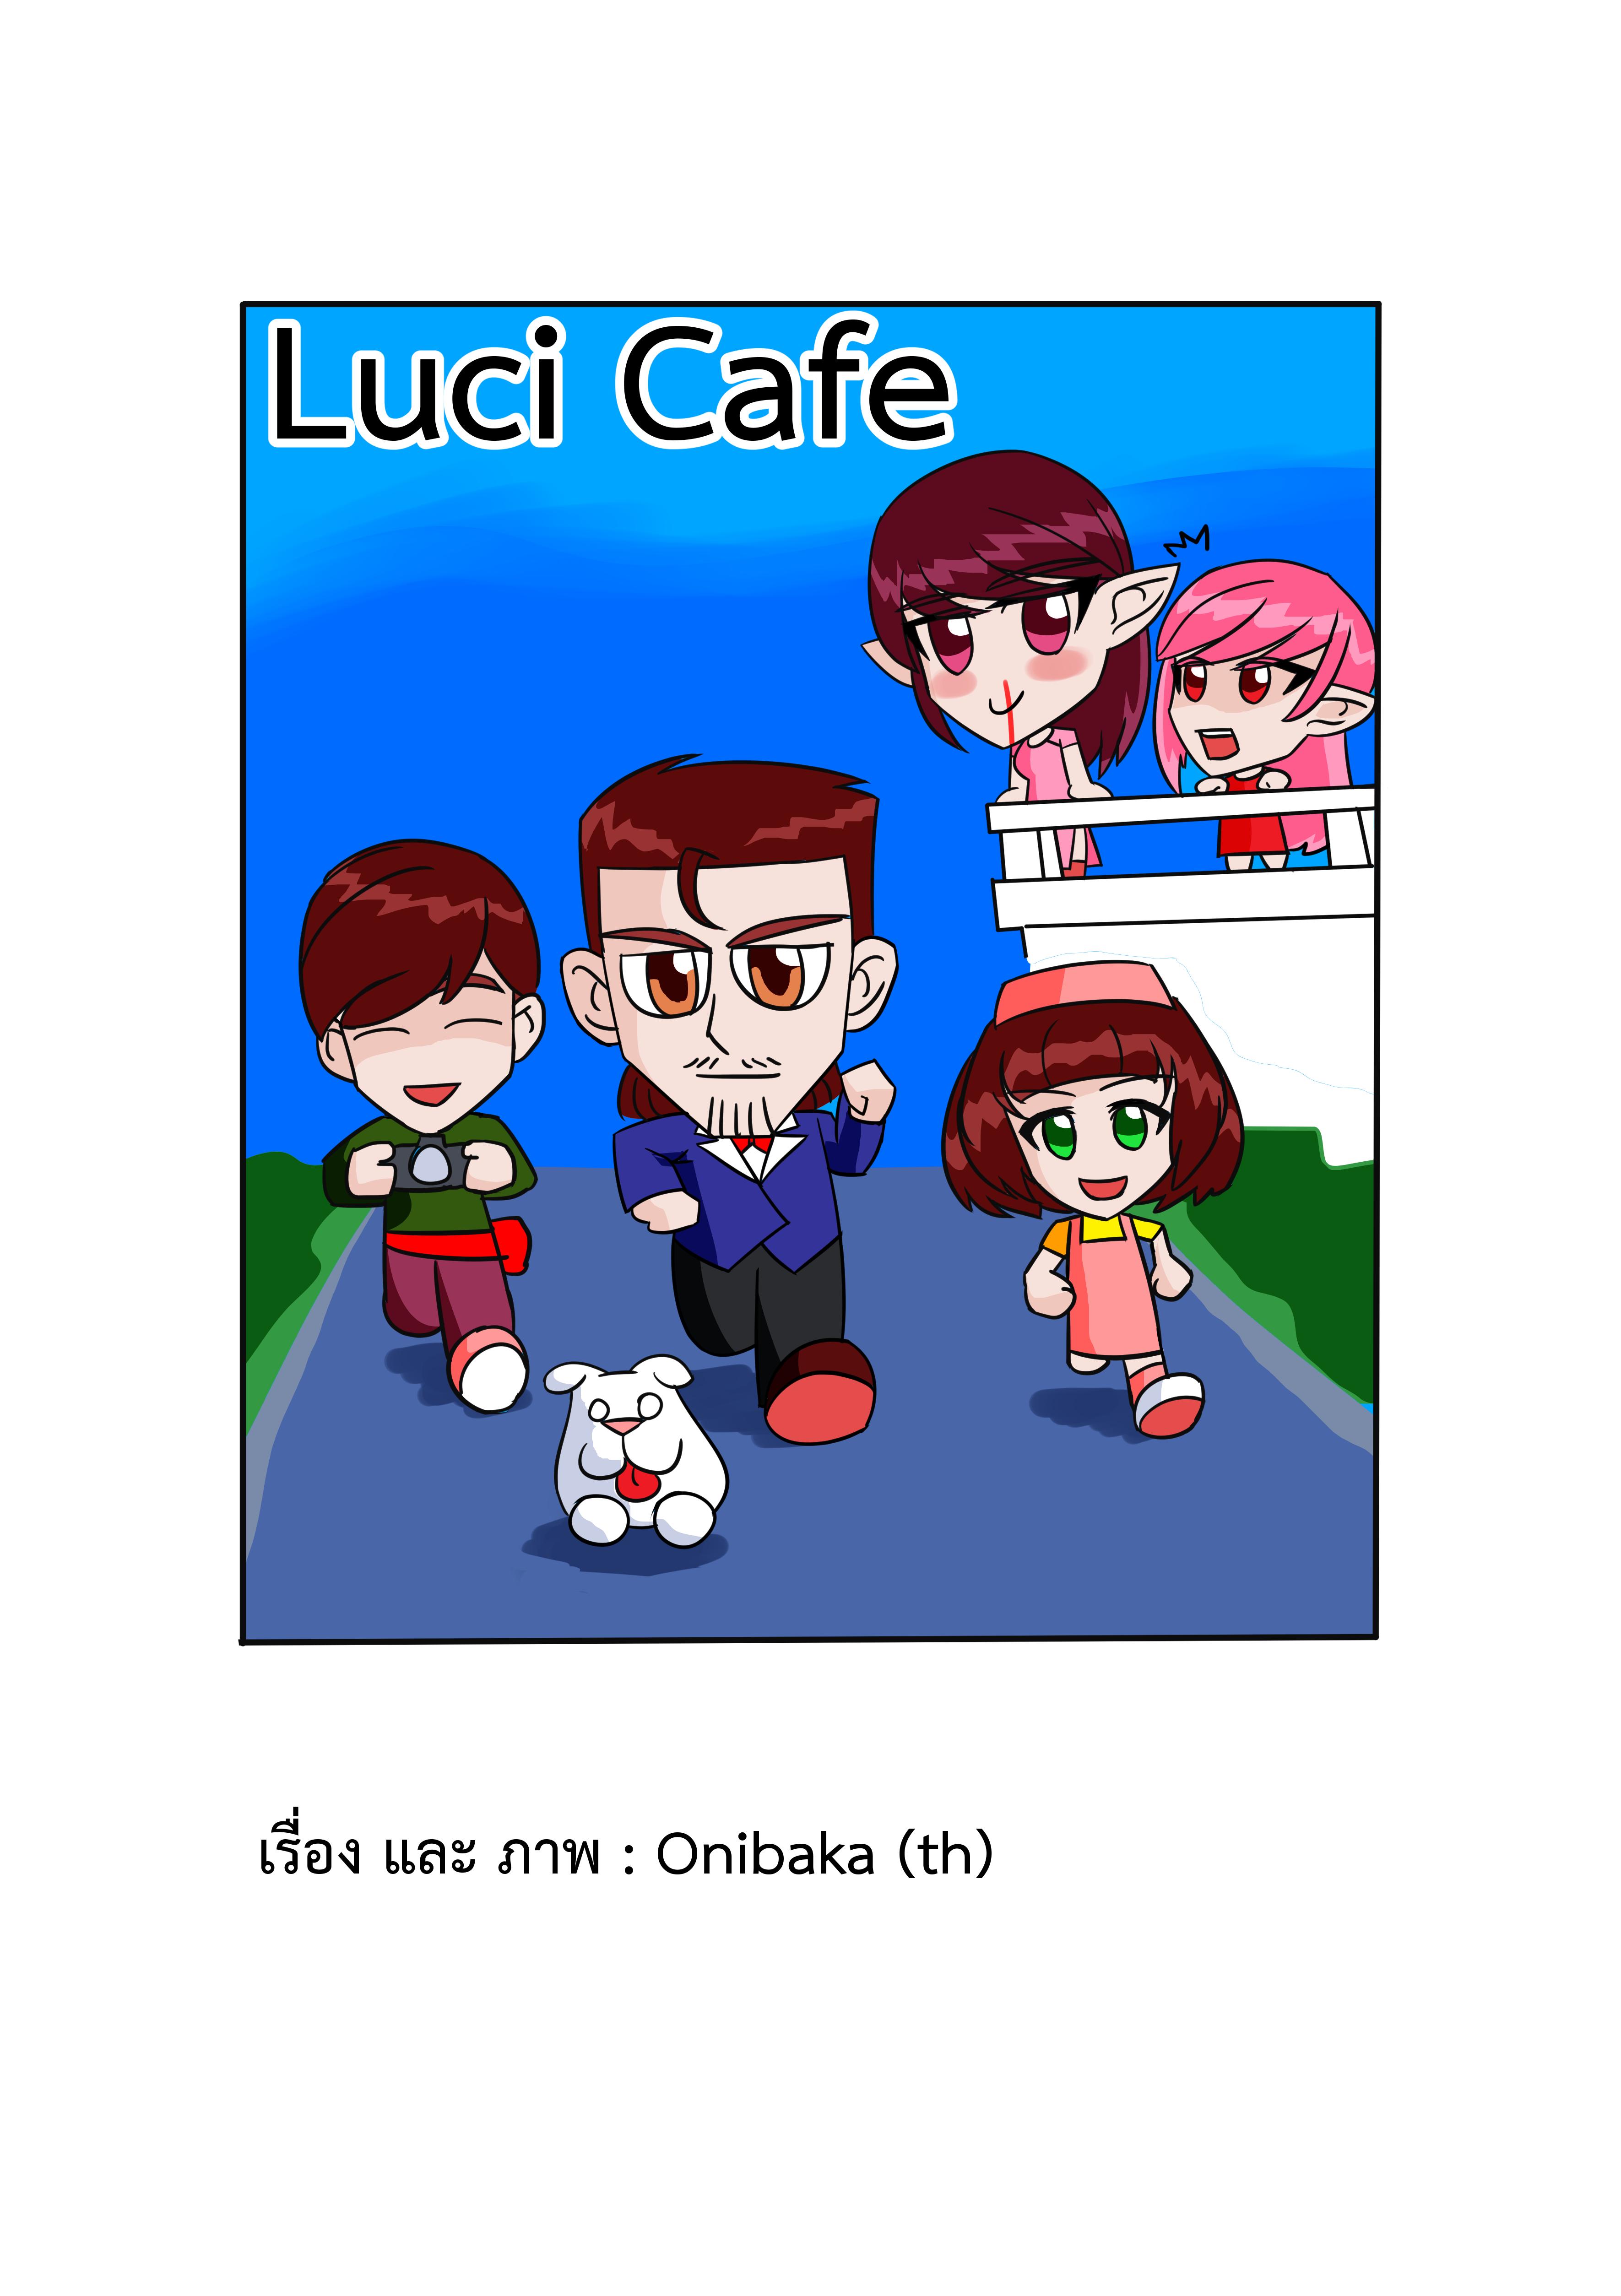 Luci Cafe